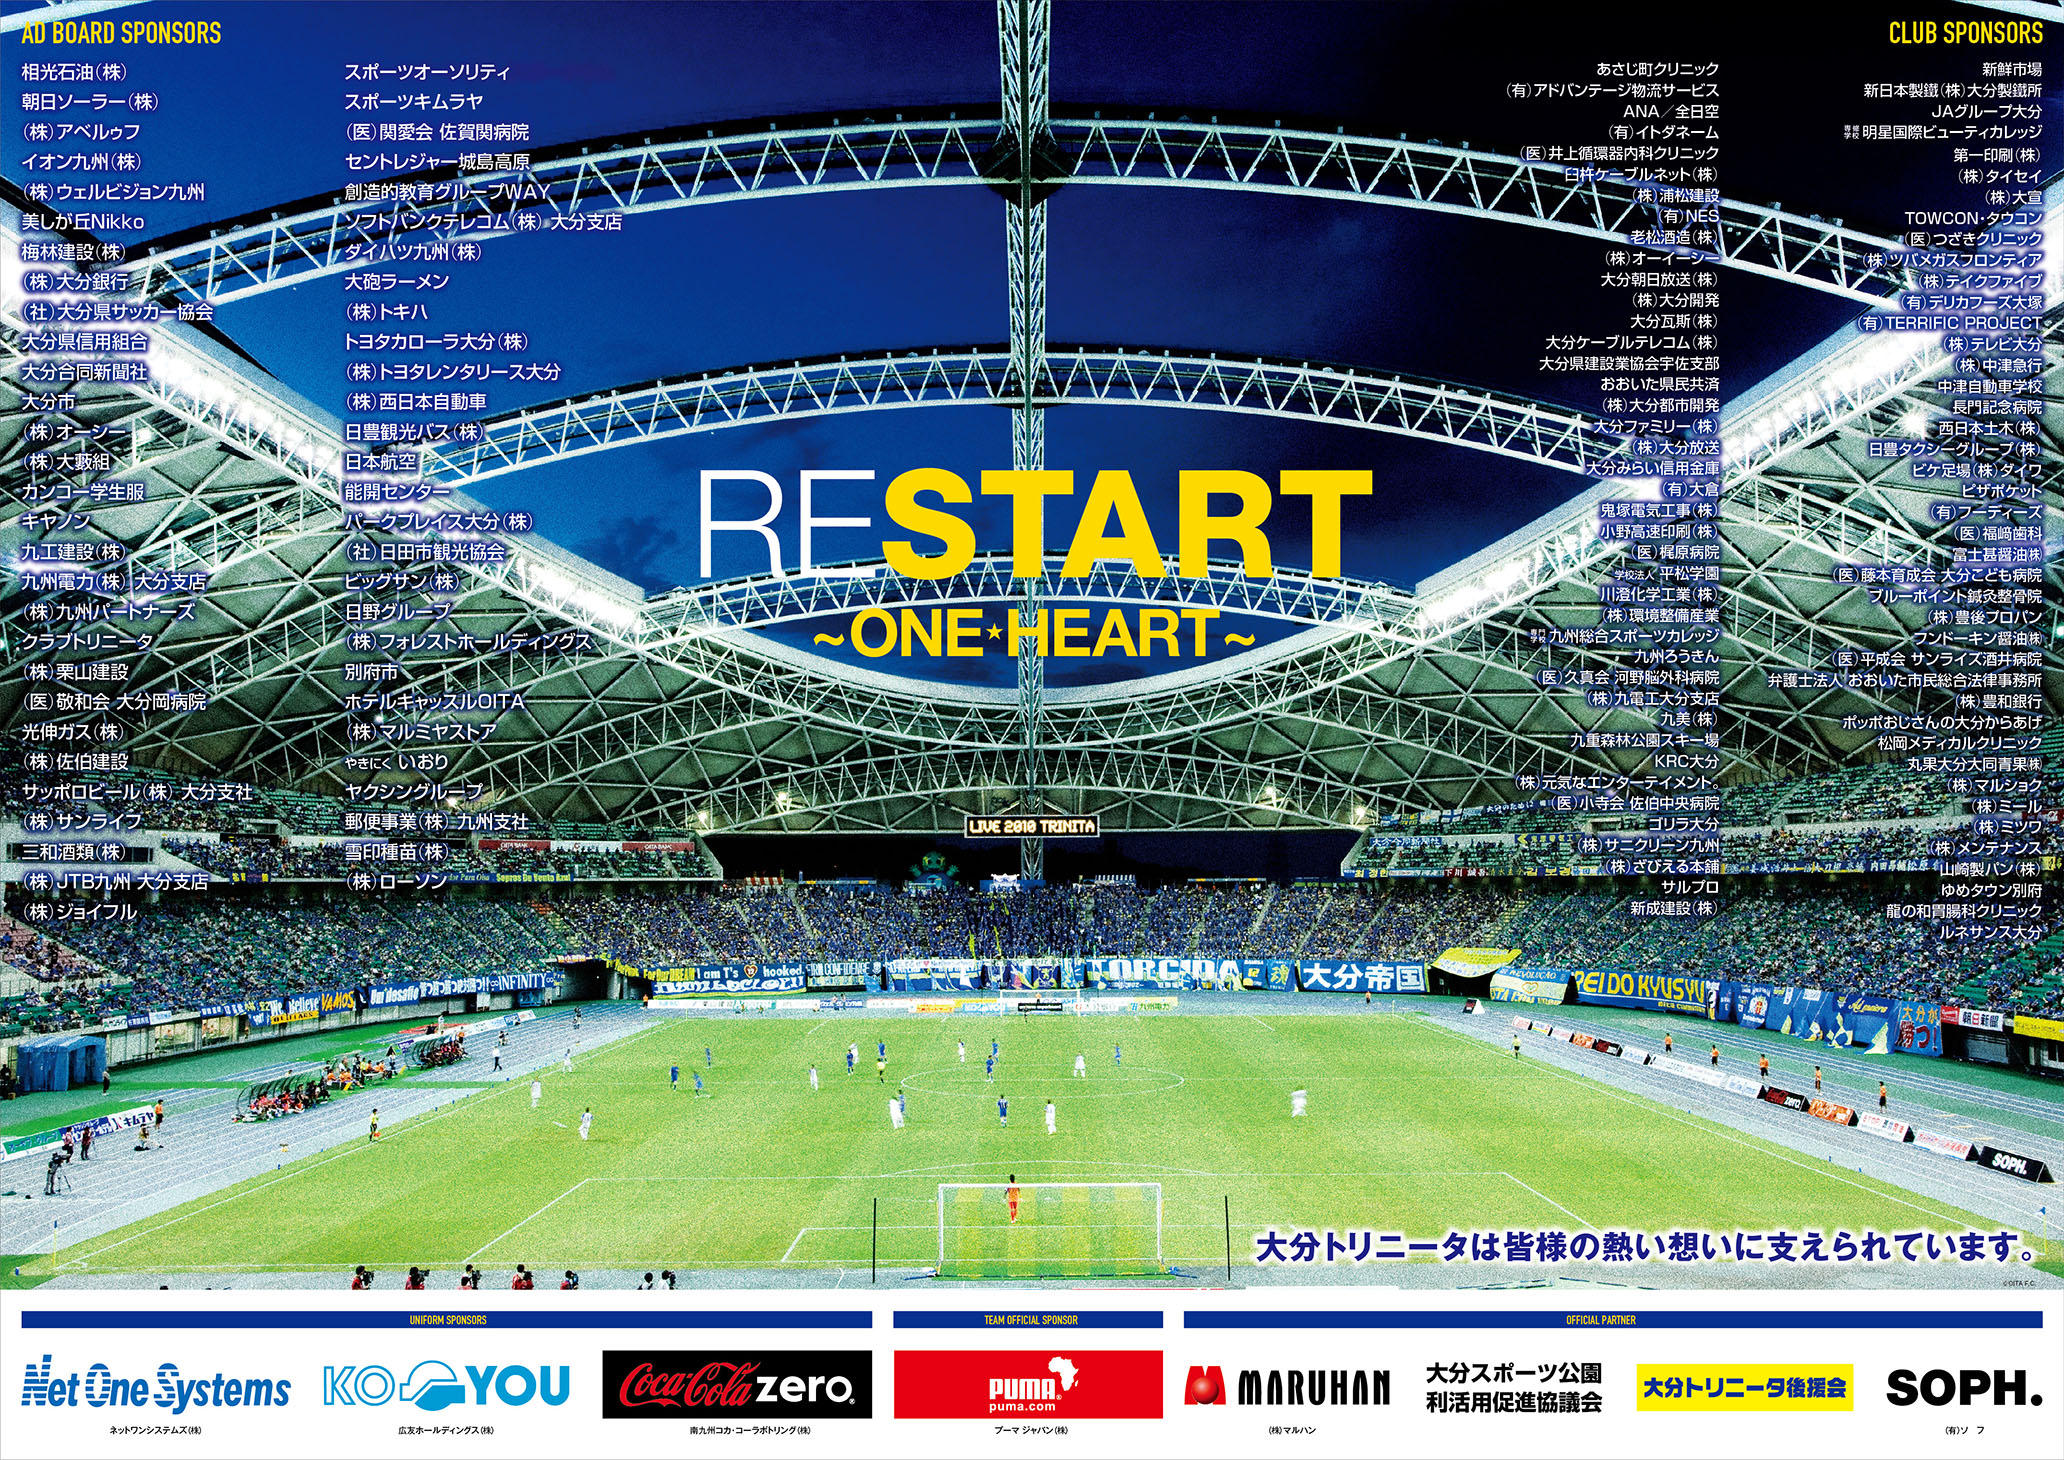 OITA TRINITA 2010後期協賛企業用ポスター